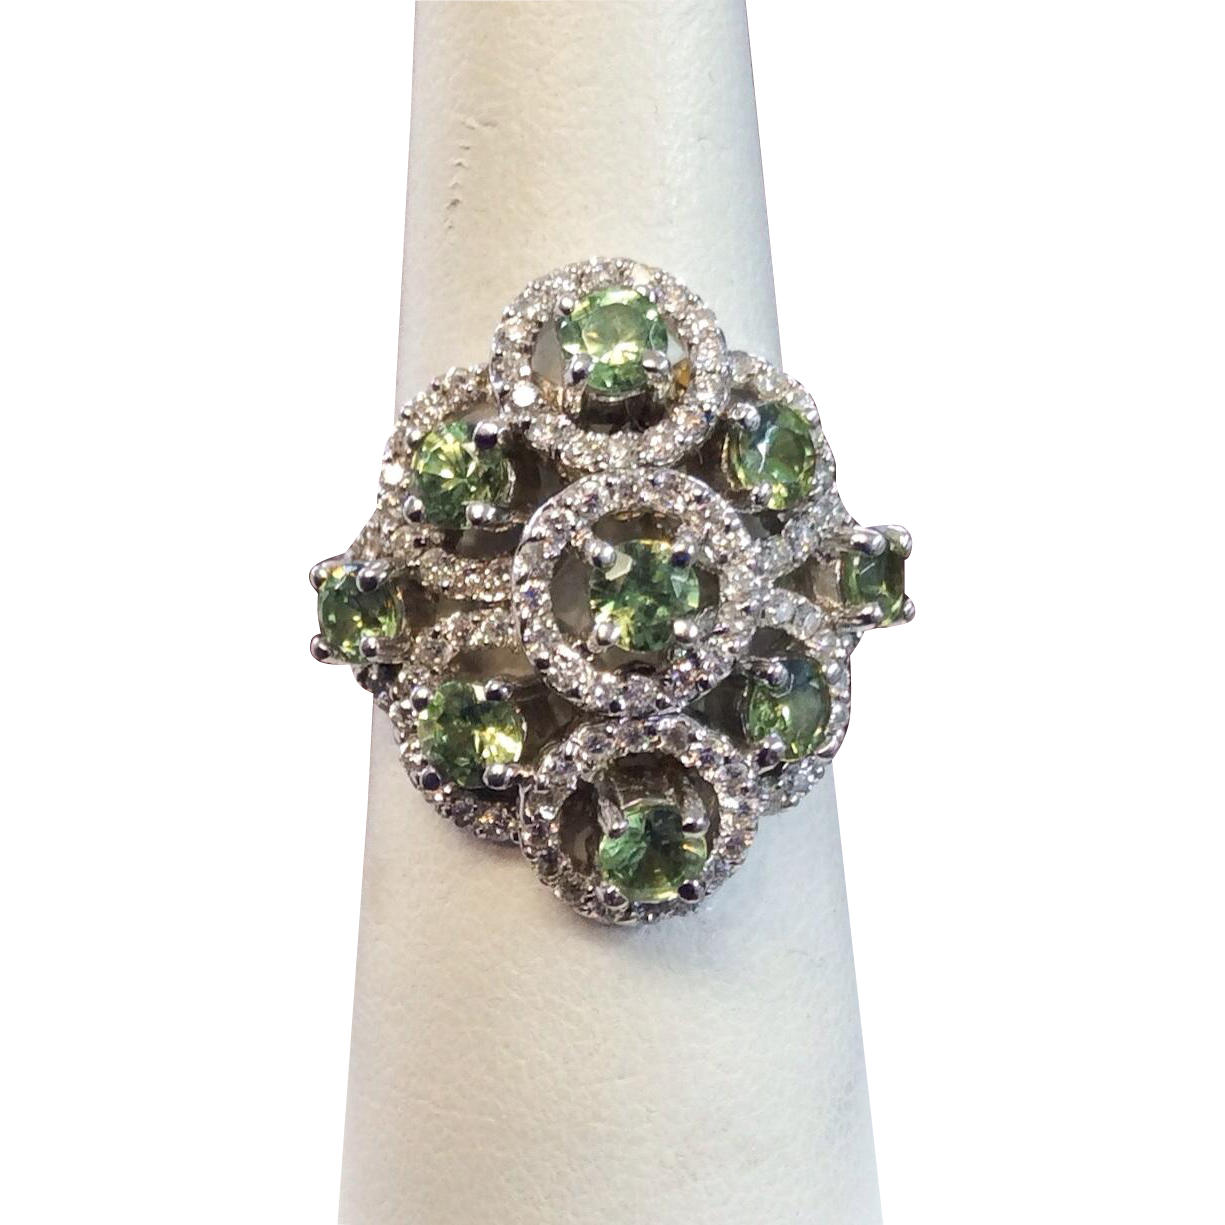 Natural Russian Demantoid Garnet & Diamond 18k White Gold Ring